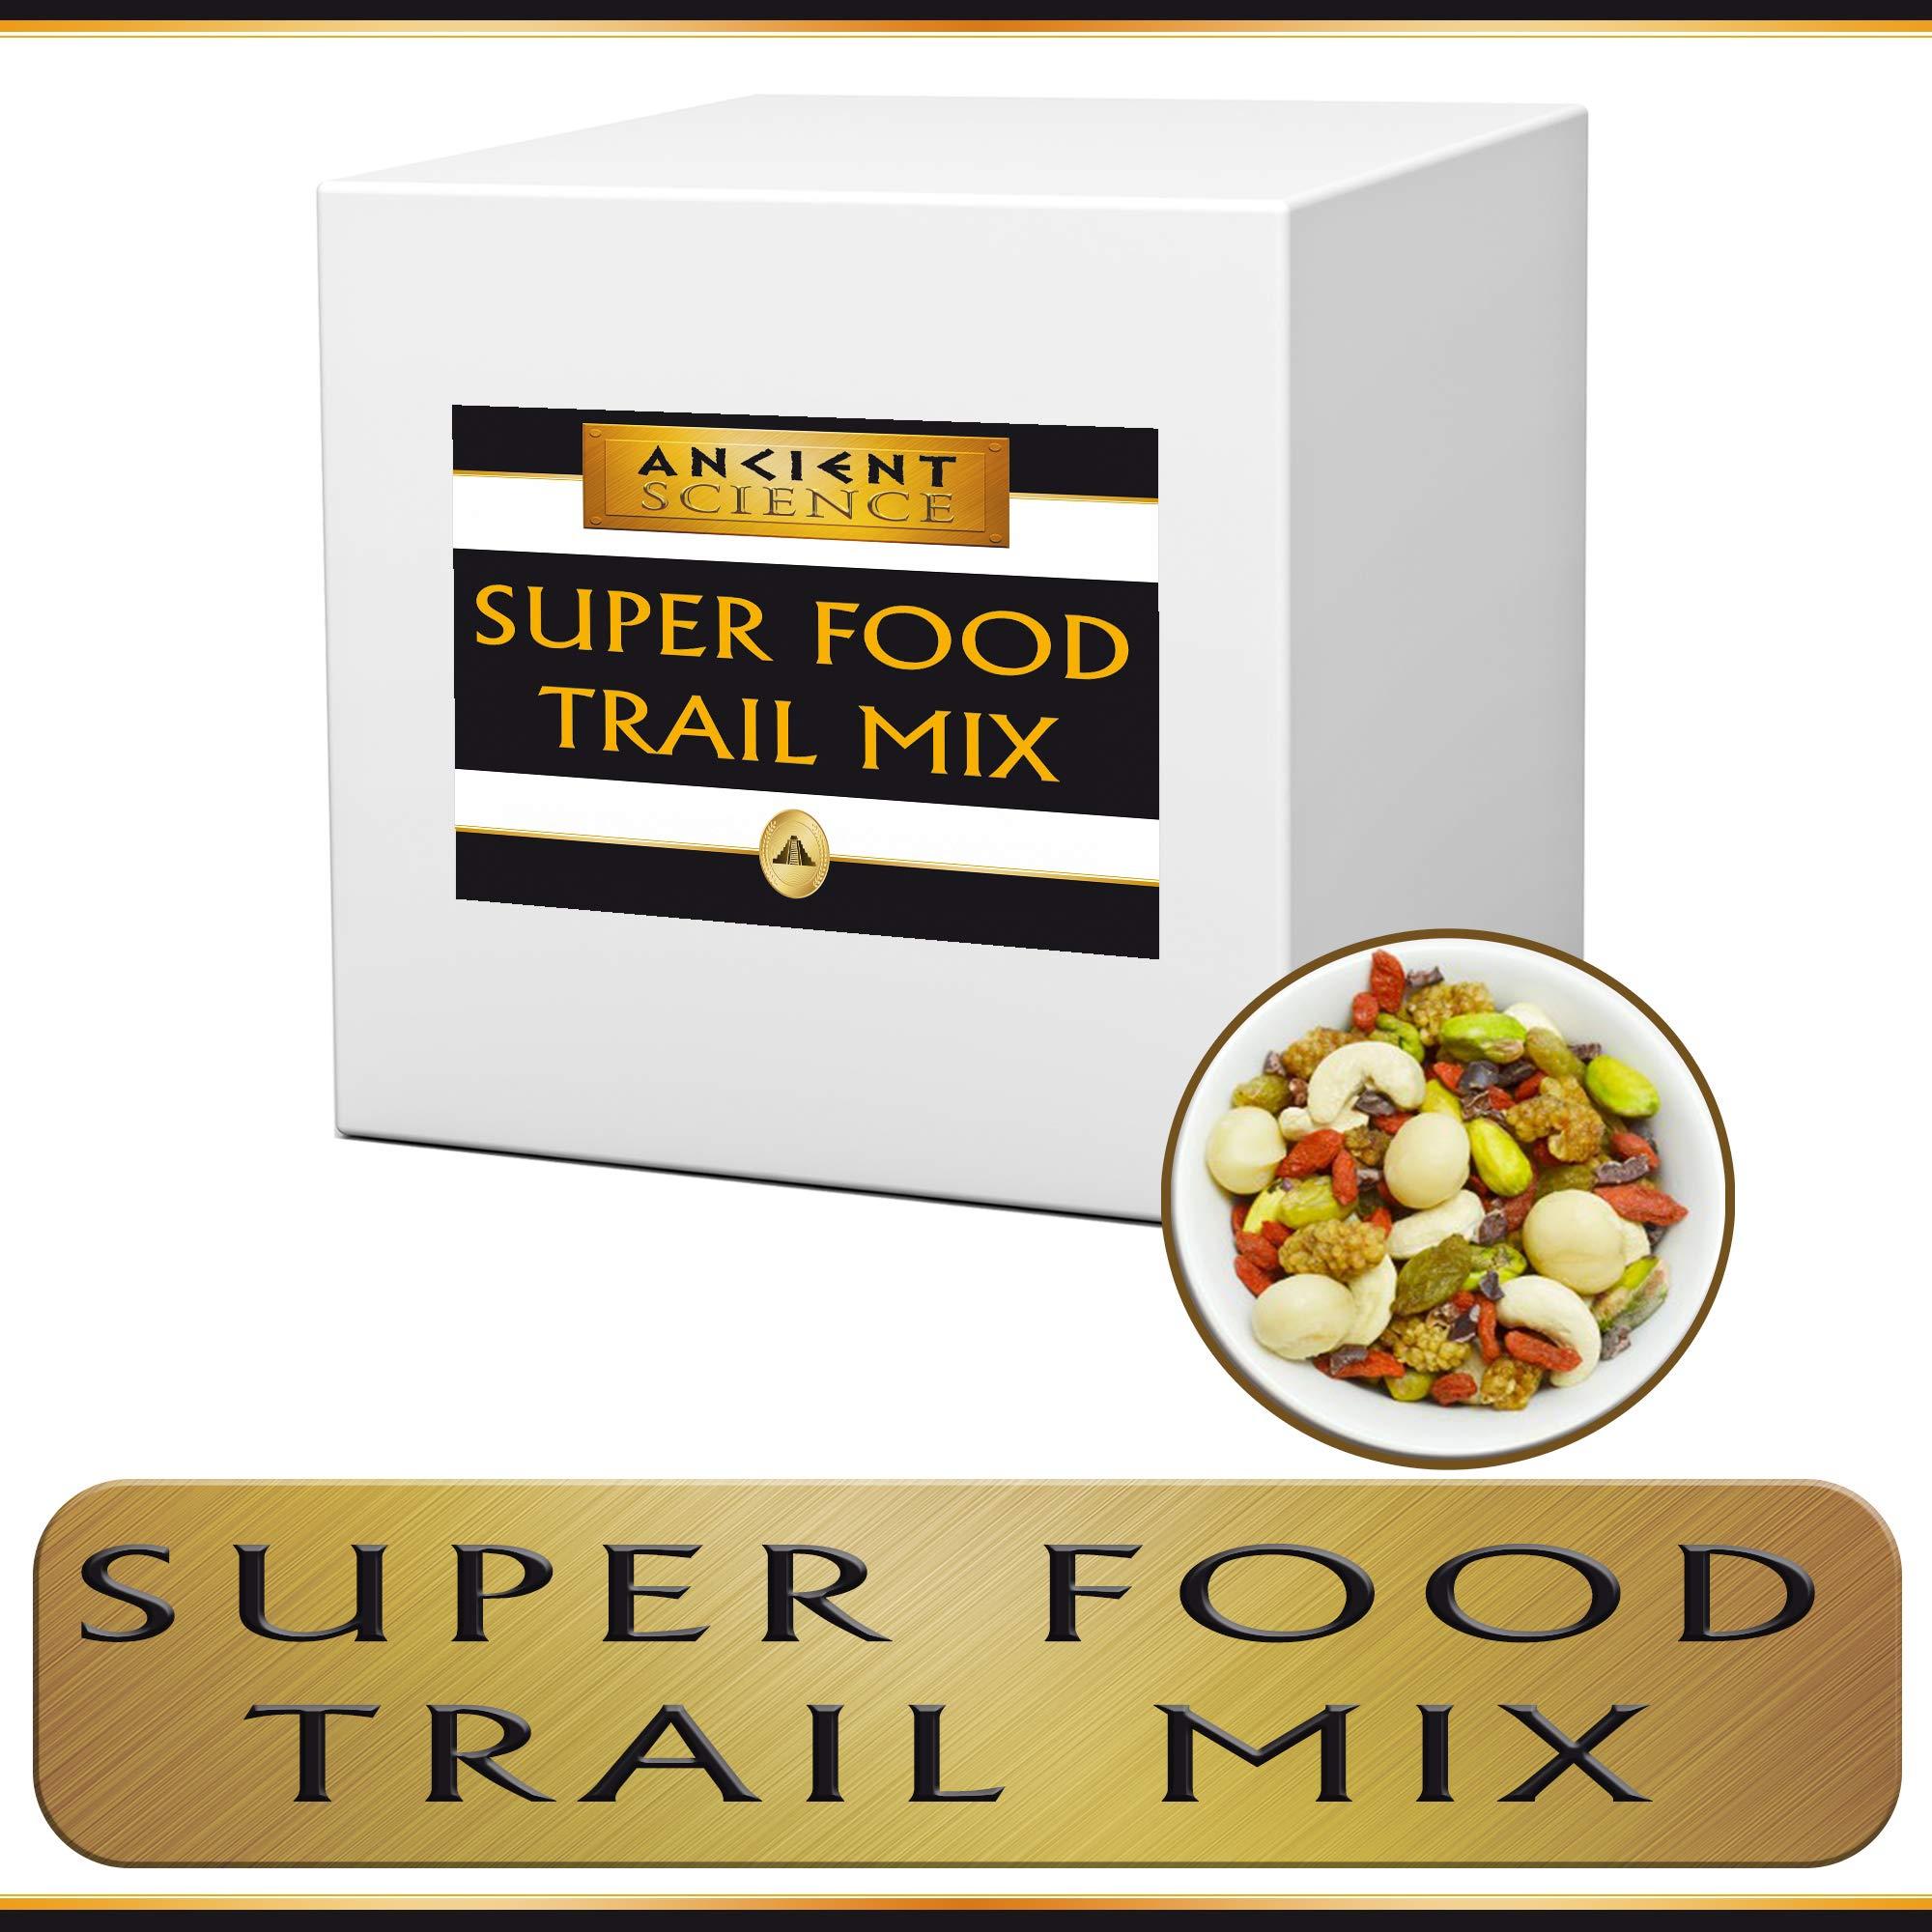 Organic Super Food Trail Mix Bulk 5 LBS - Gojiberries, Macadamia Nuts, Cashews, Cacao Nibs